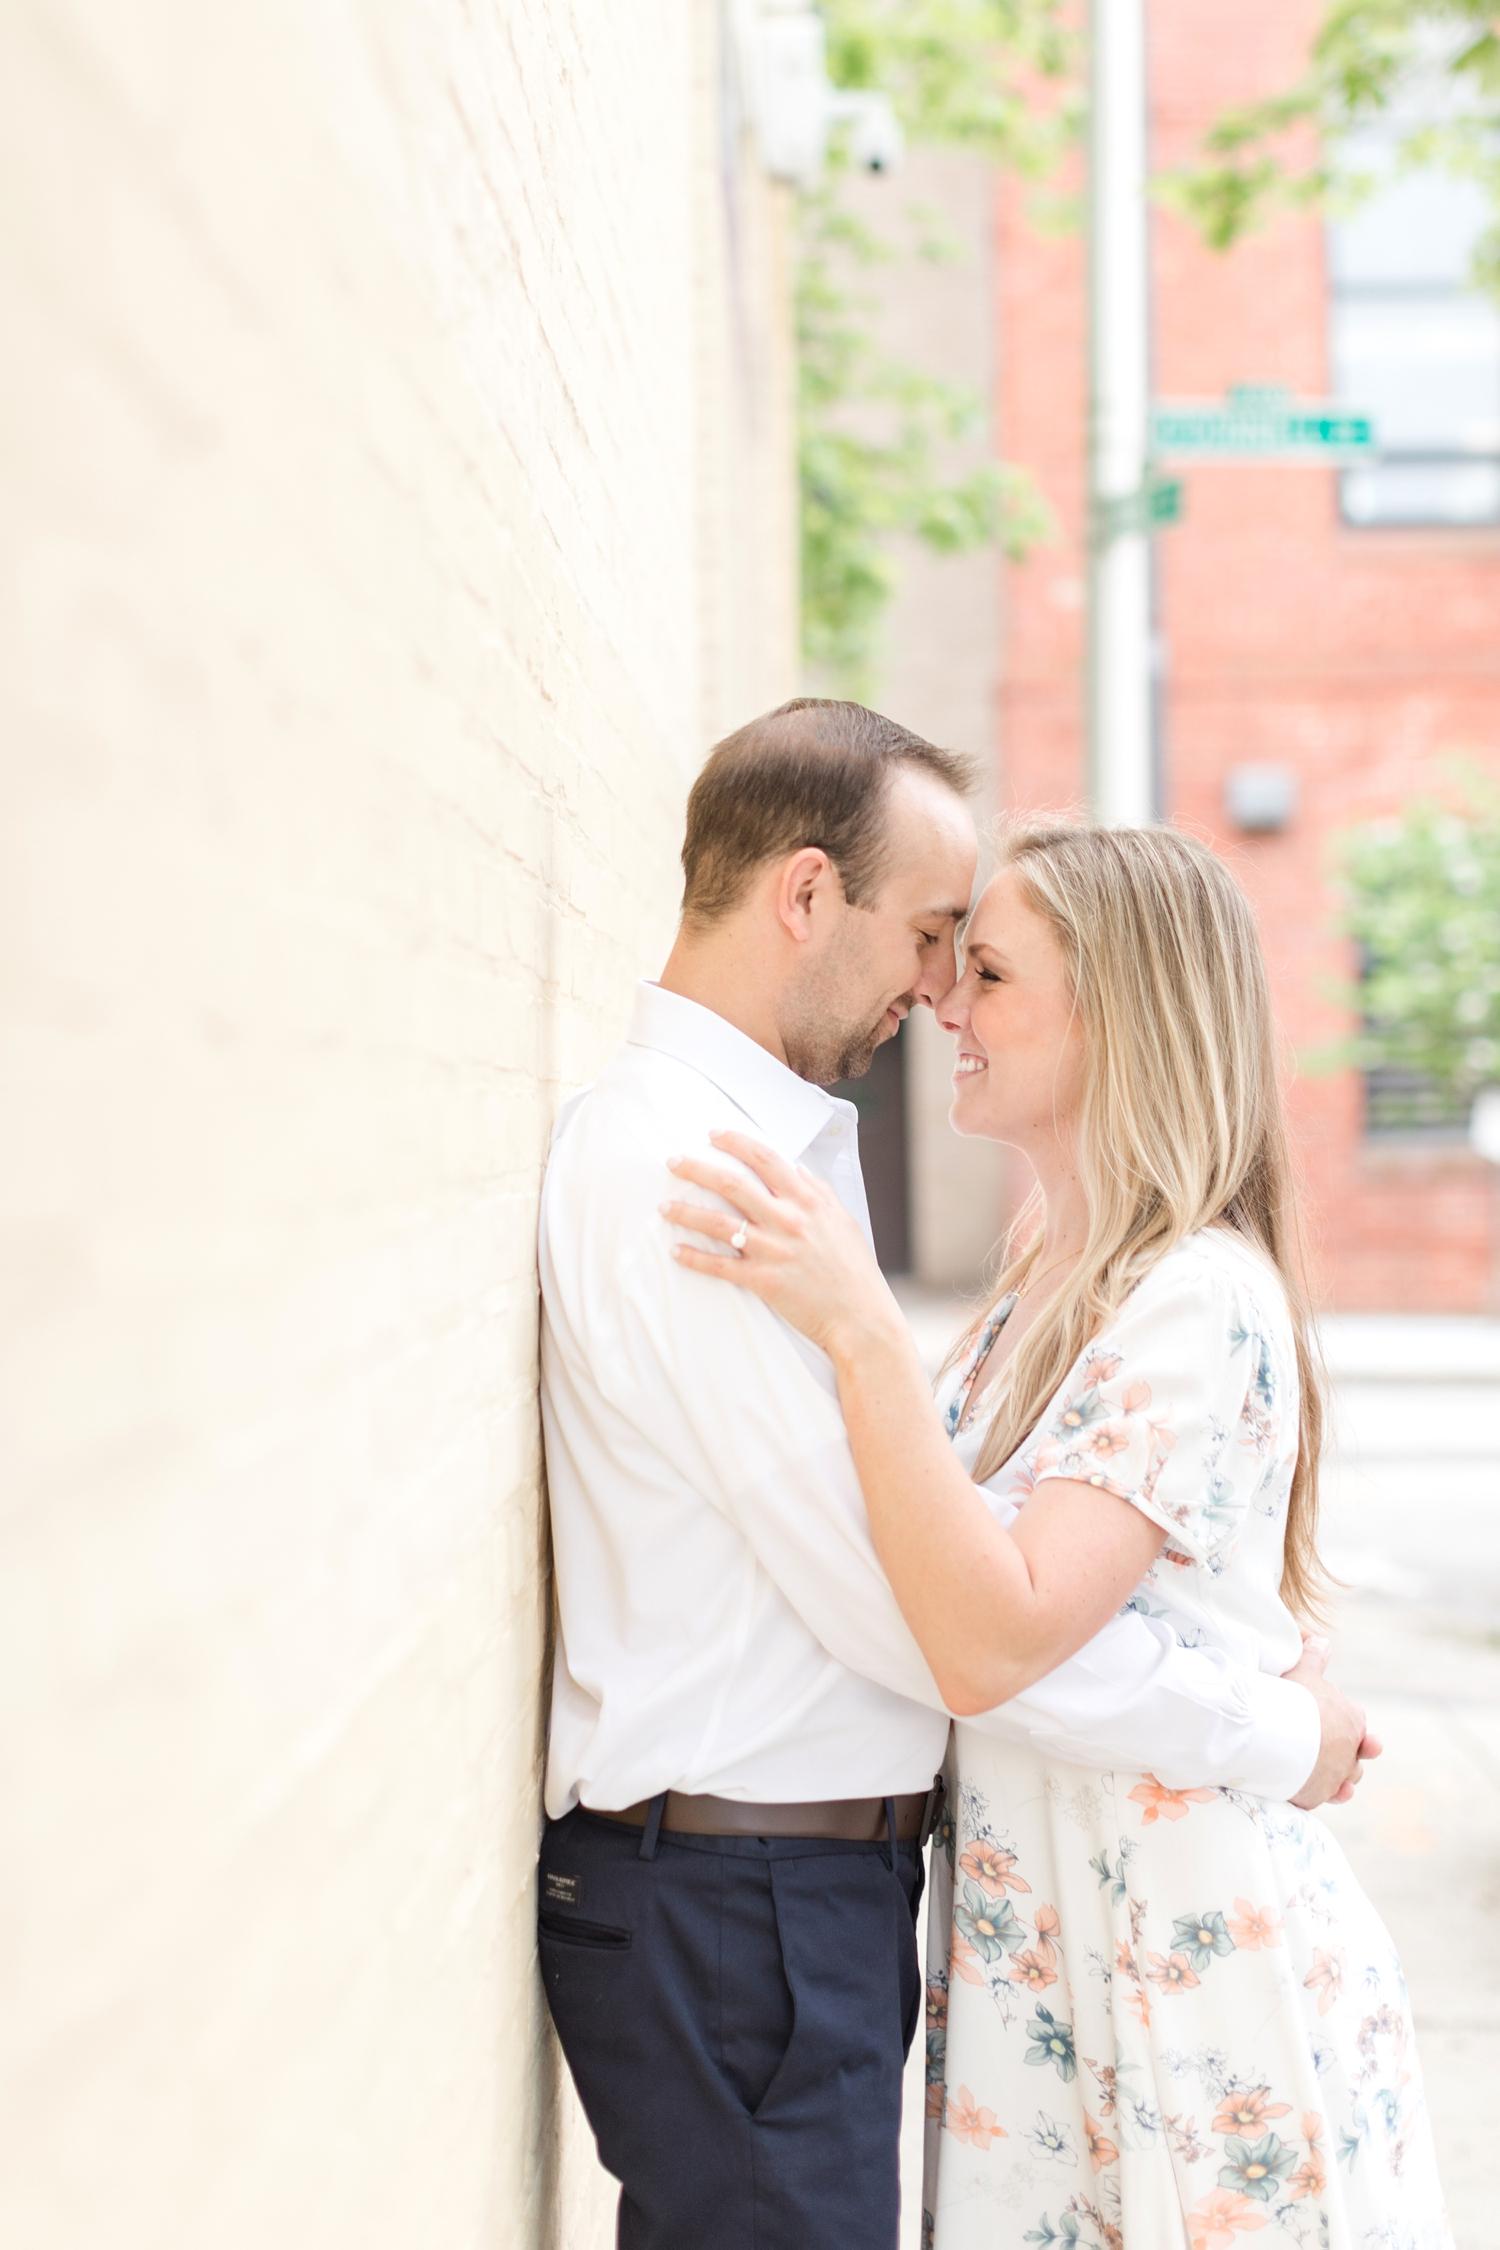 Maddy and Lloyd Engagement-132_Baltimore-Maryland-engagement-photography-Sherwood-Gardens-Maryland-engagement-photographer-anna-grace-photography-photo.jpg